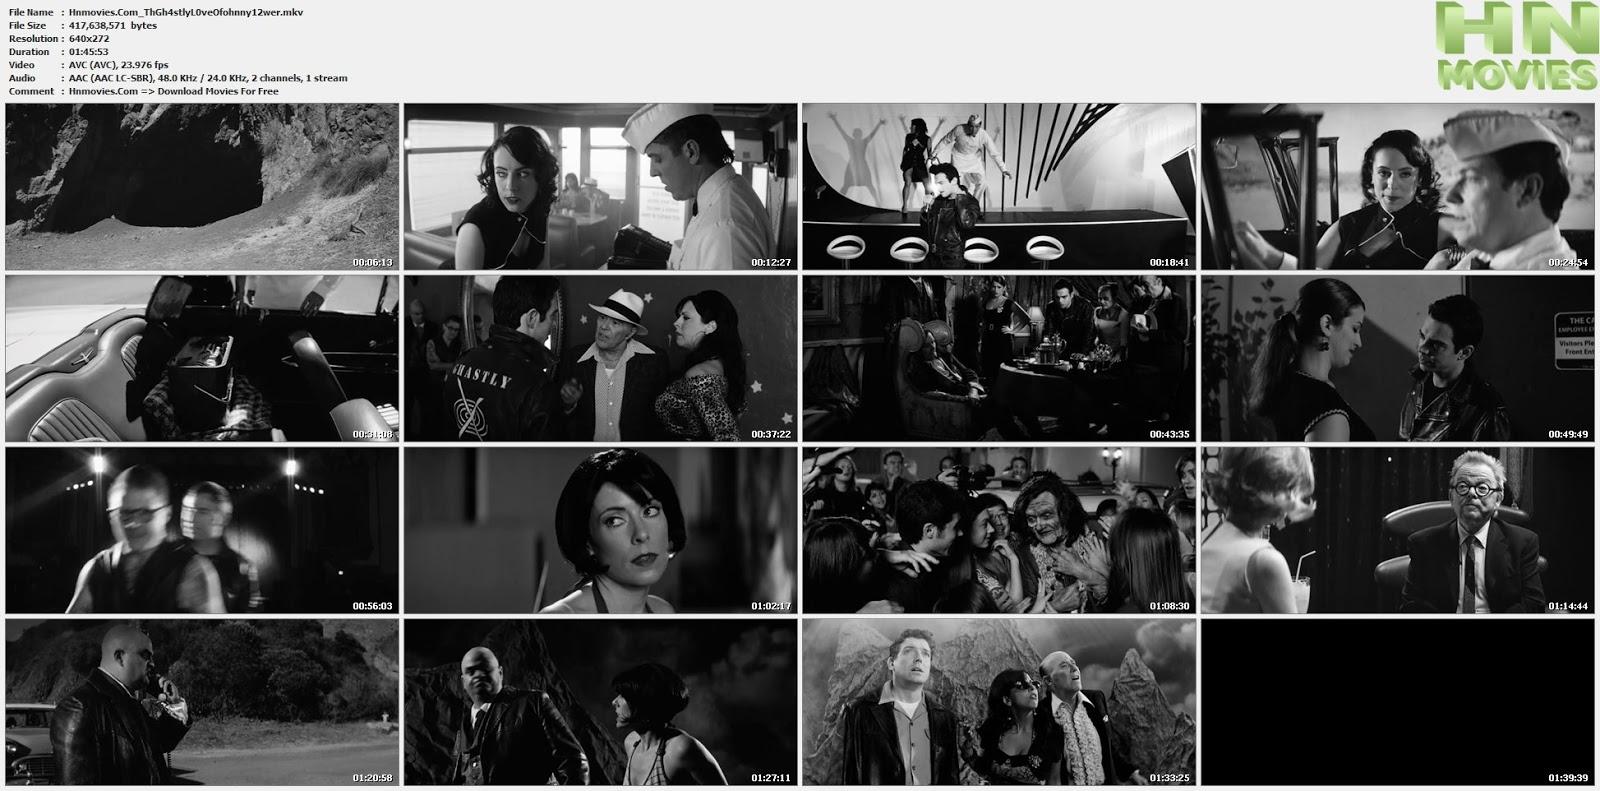 movie screenshot of The Ghastly Love Of Johnny X fdmovie.com